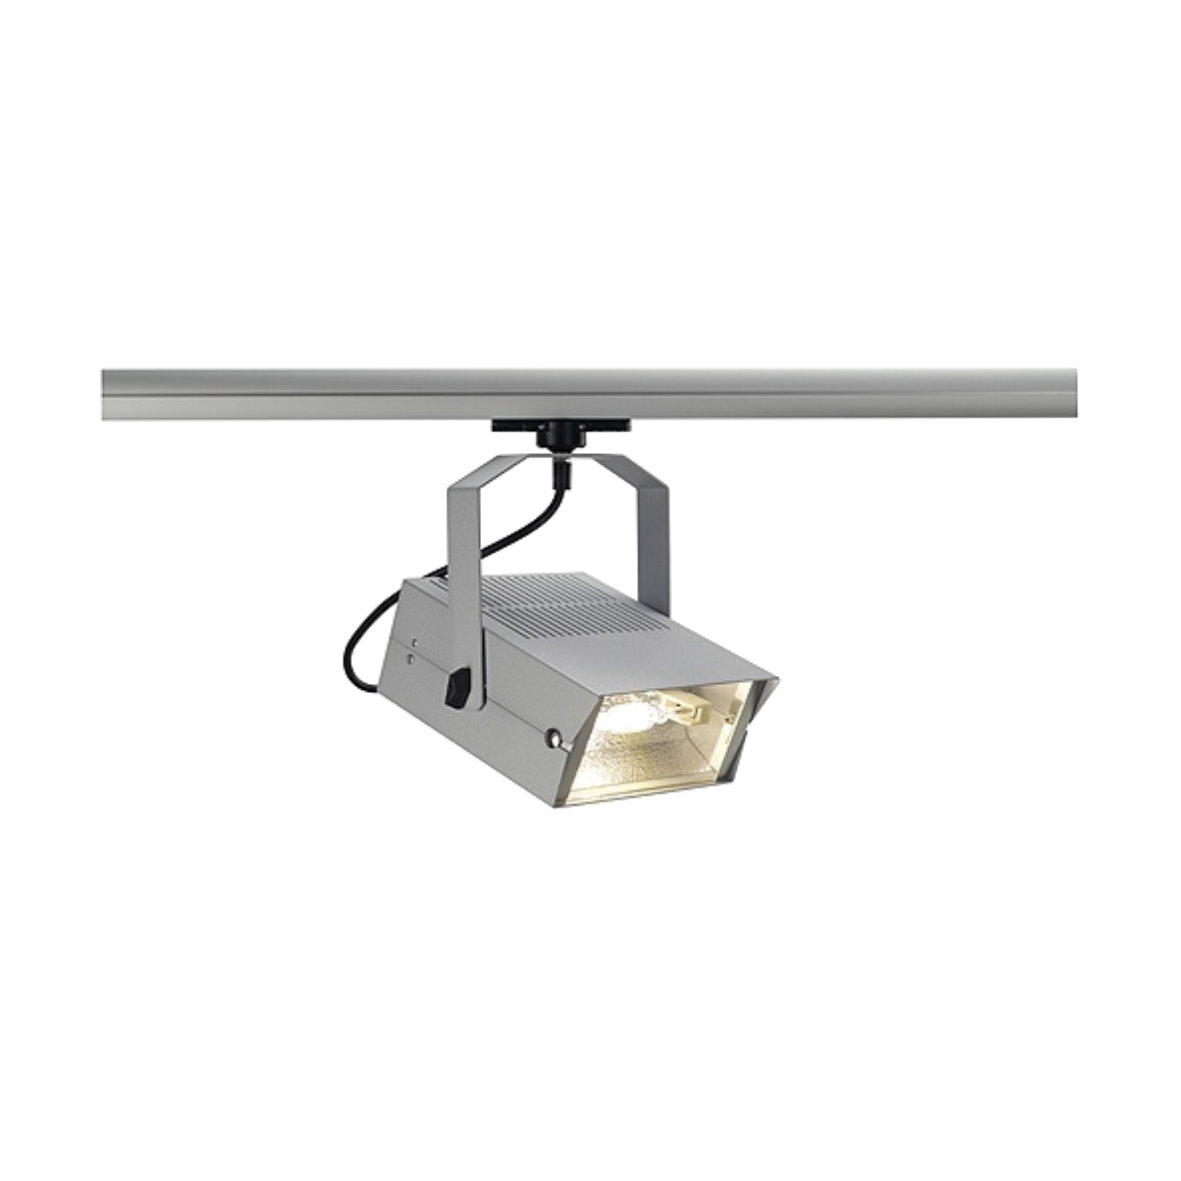 slv 3 phasen spot strahler incl adapter leuchte stromschiene schiene 3p 230v ebay. Black Bedroom Furniture Sets. Home Design Ideas